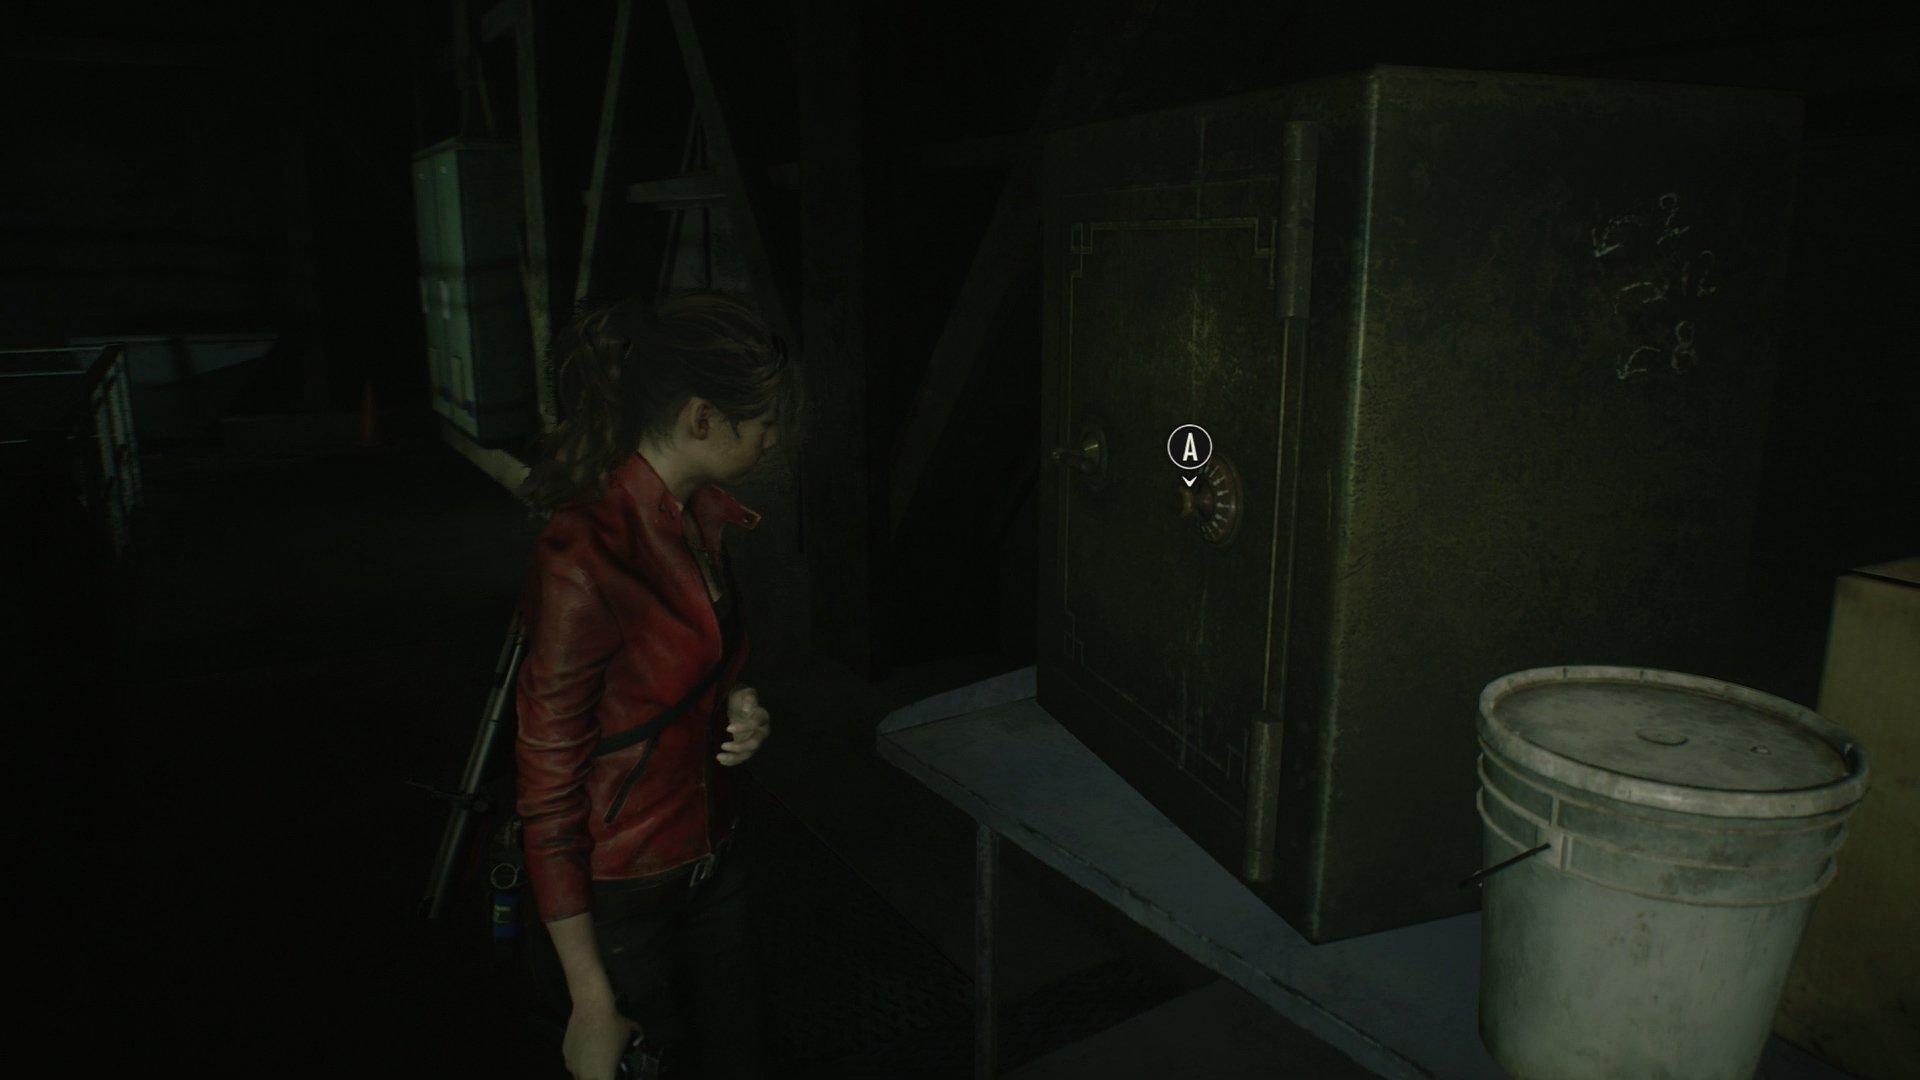 Resident Evil 2 Treatment Pool Room safe